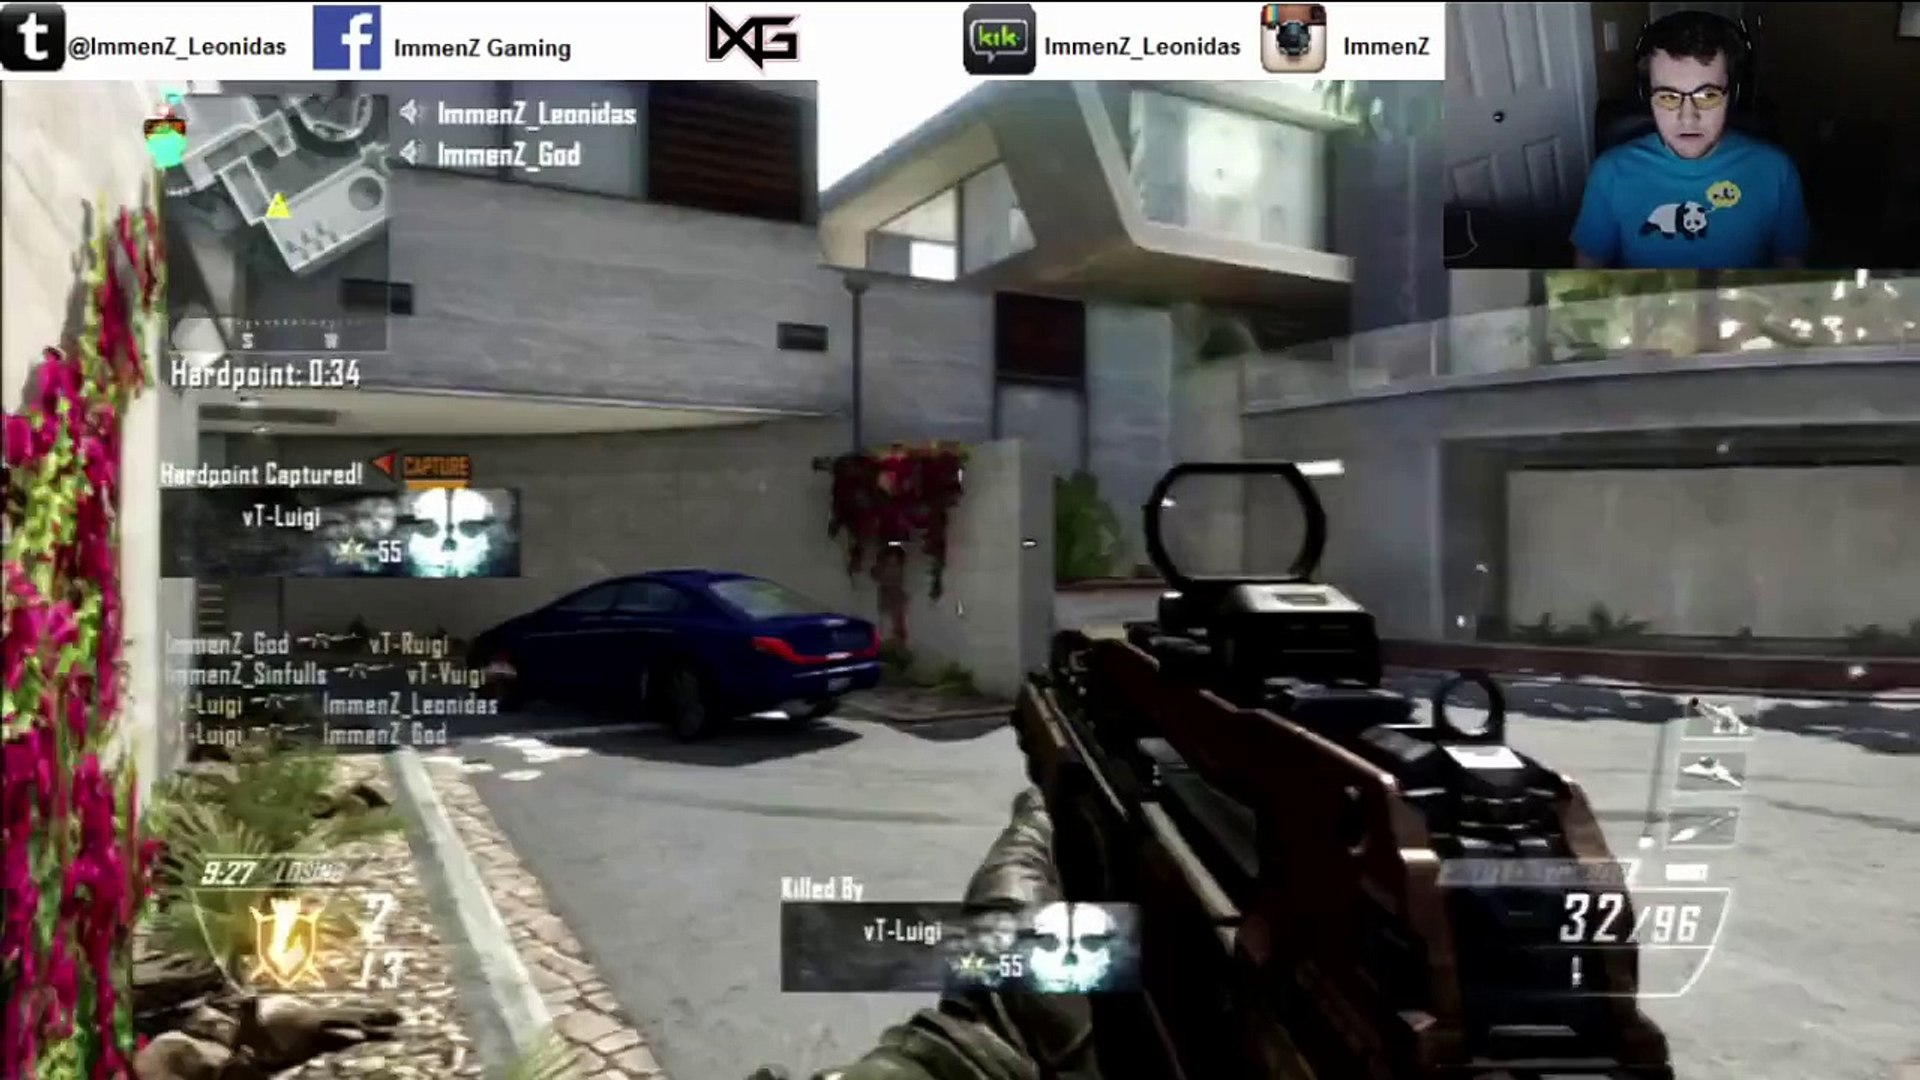 ImmenZ Gaming vs vT Gaming